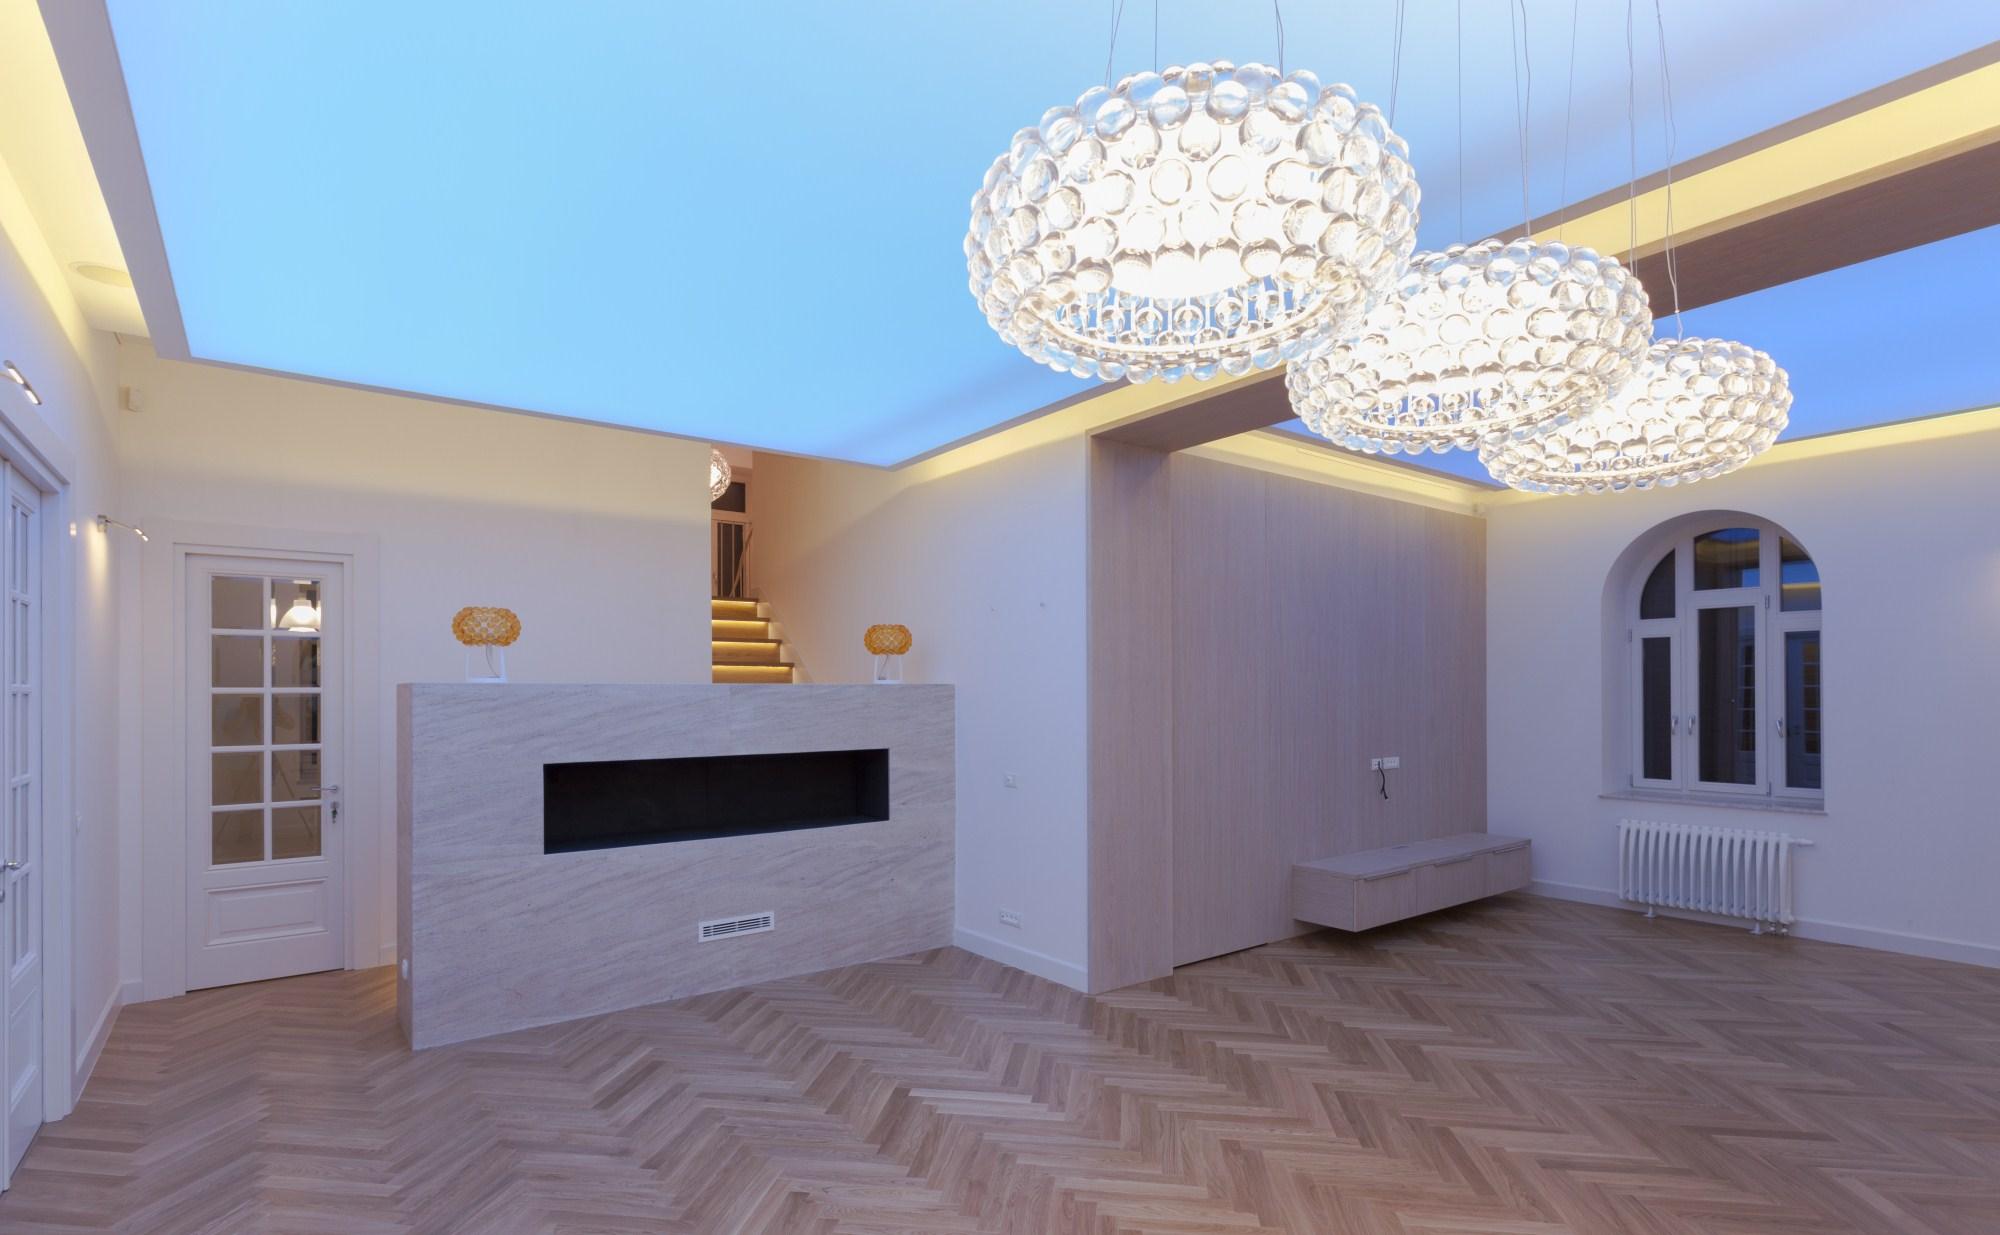 https://nbc-arhitect.ro/wp-content/uploads/2020/10/NBC-Arhitect-_-restorations-_-Washington-House-_-Bucharest-Romania_55.jpg